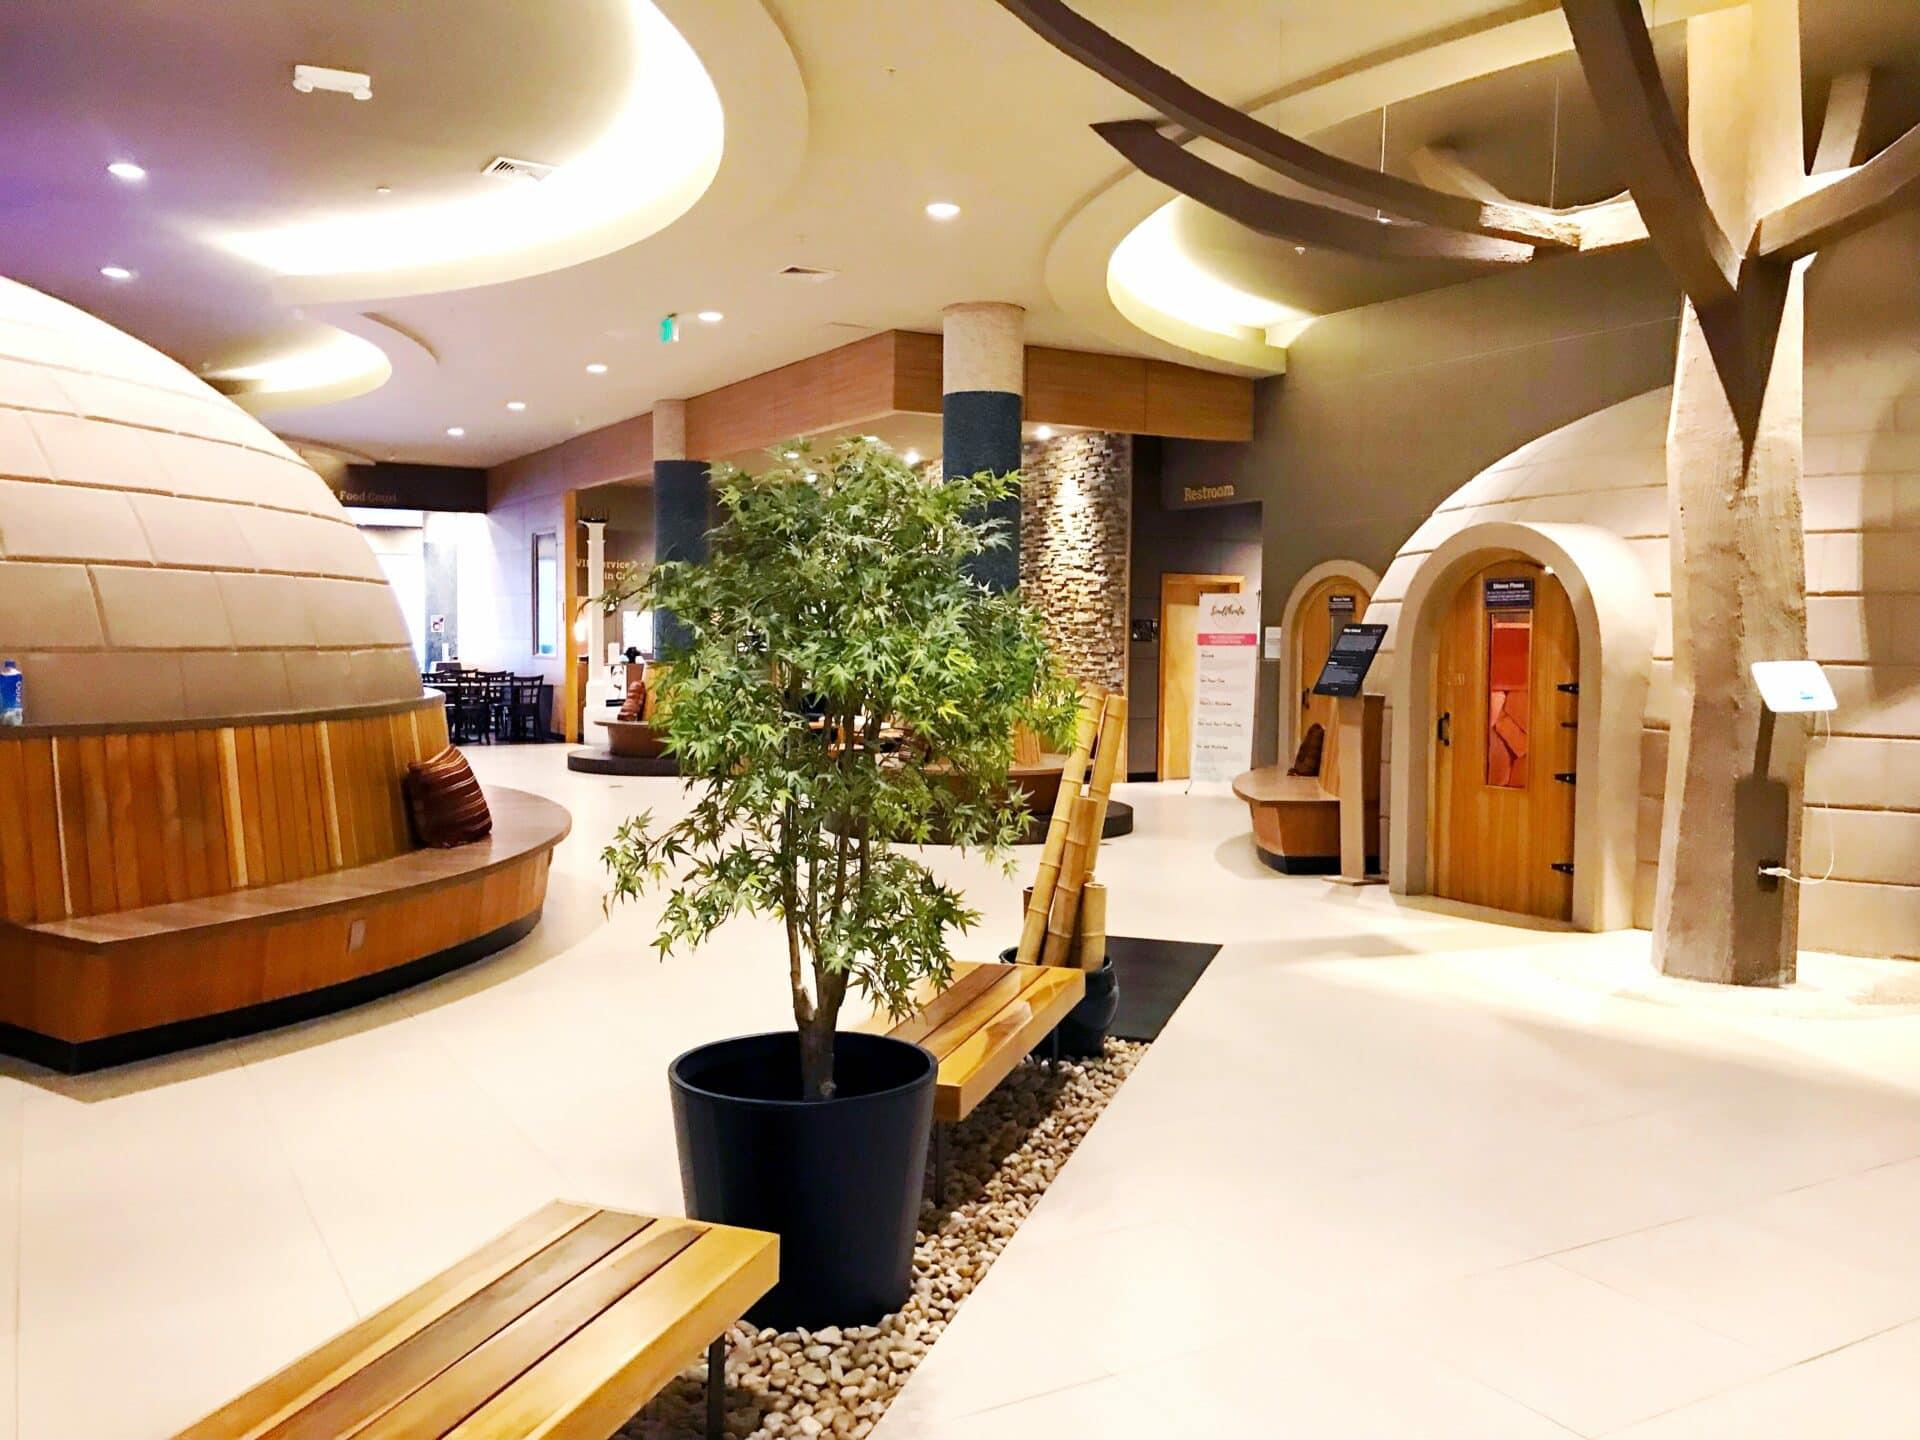 Island Spa & Sauna: Korean Spa In Edison